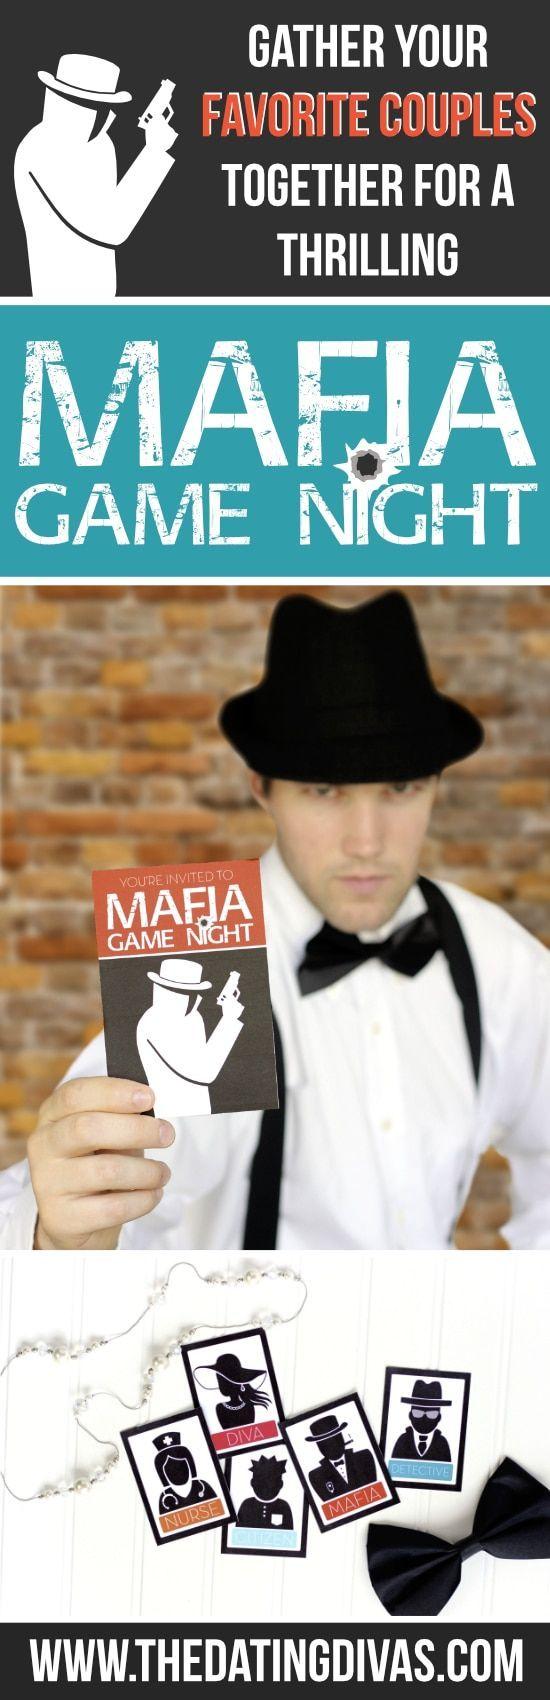 Mafia Date Night Game night parties, Couples game night